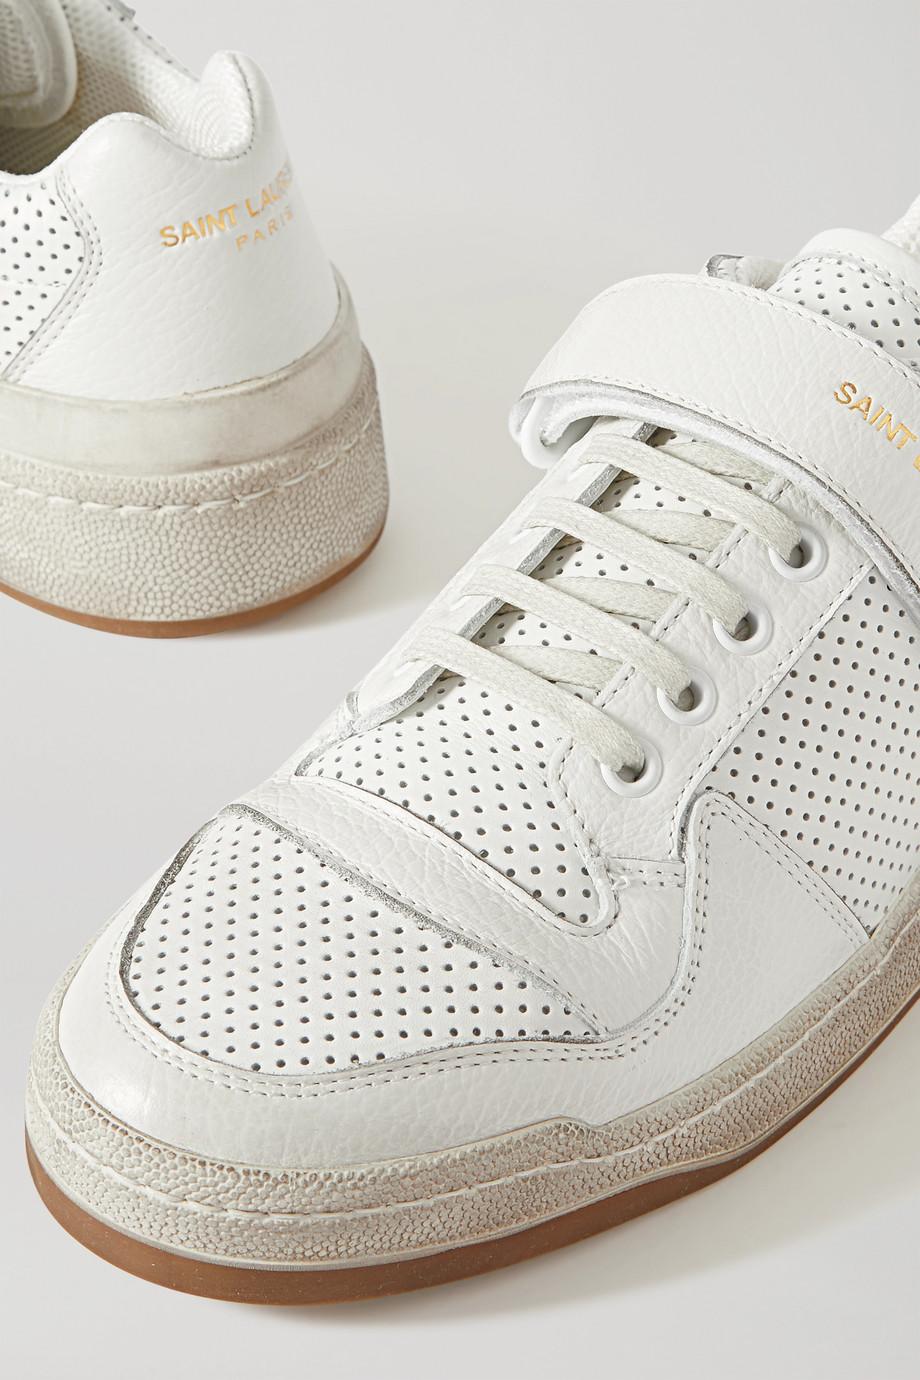 Tenis para novia Net-A-Porter, los tenis más cool para novia - Saint Laurent - Wedding Hub - 04